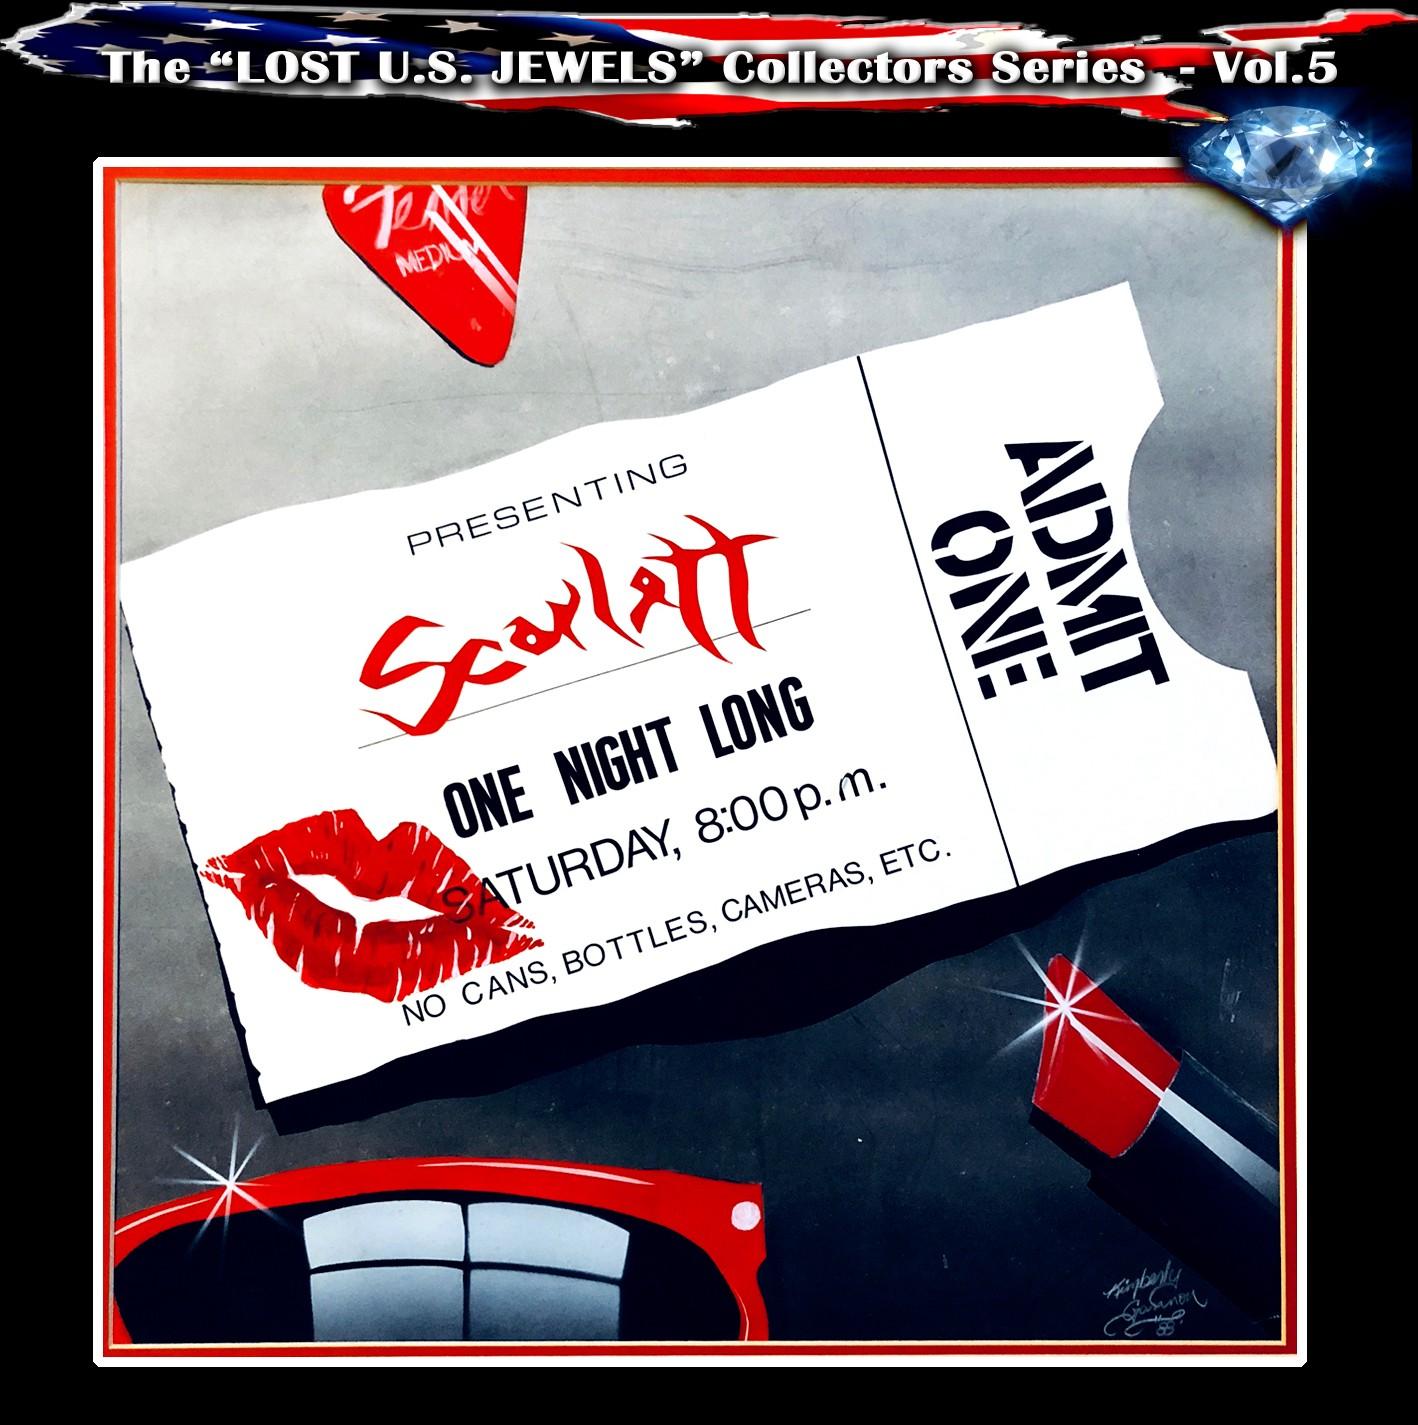 SCARLETT - One Night Long +4 (digitally remastered)